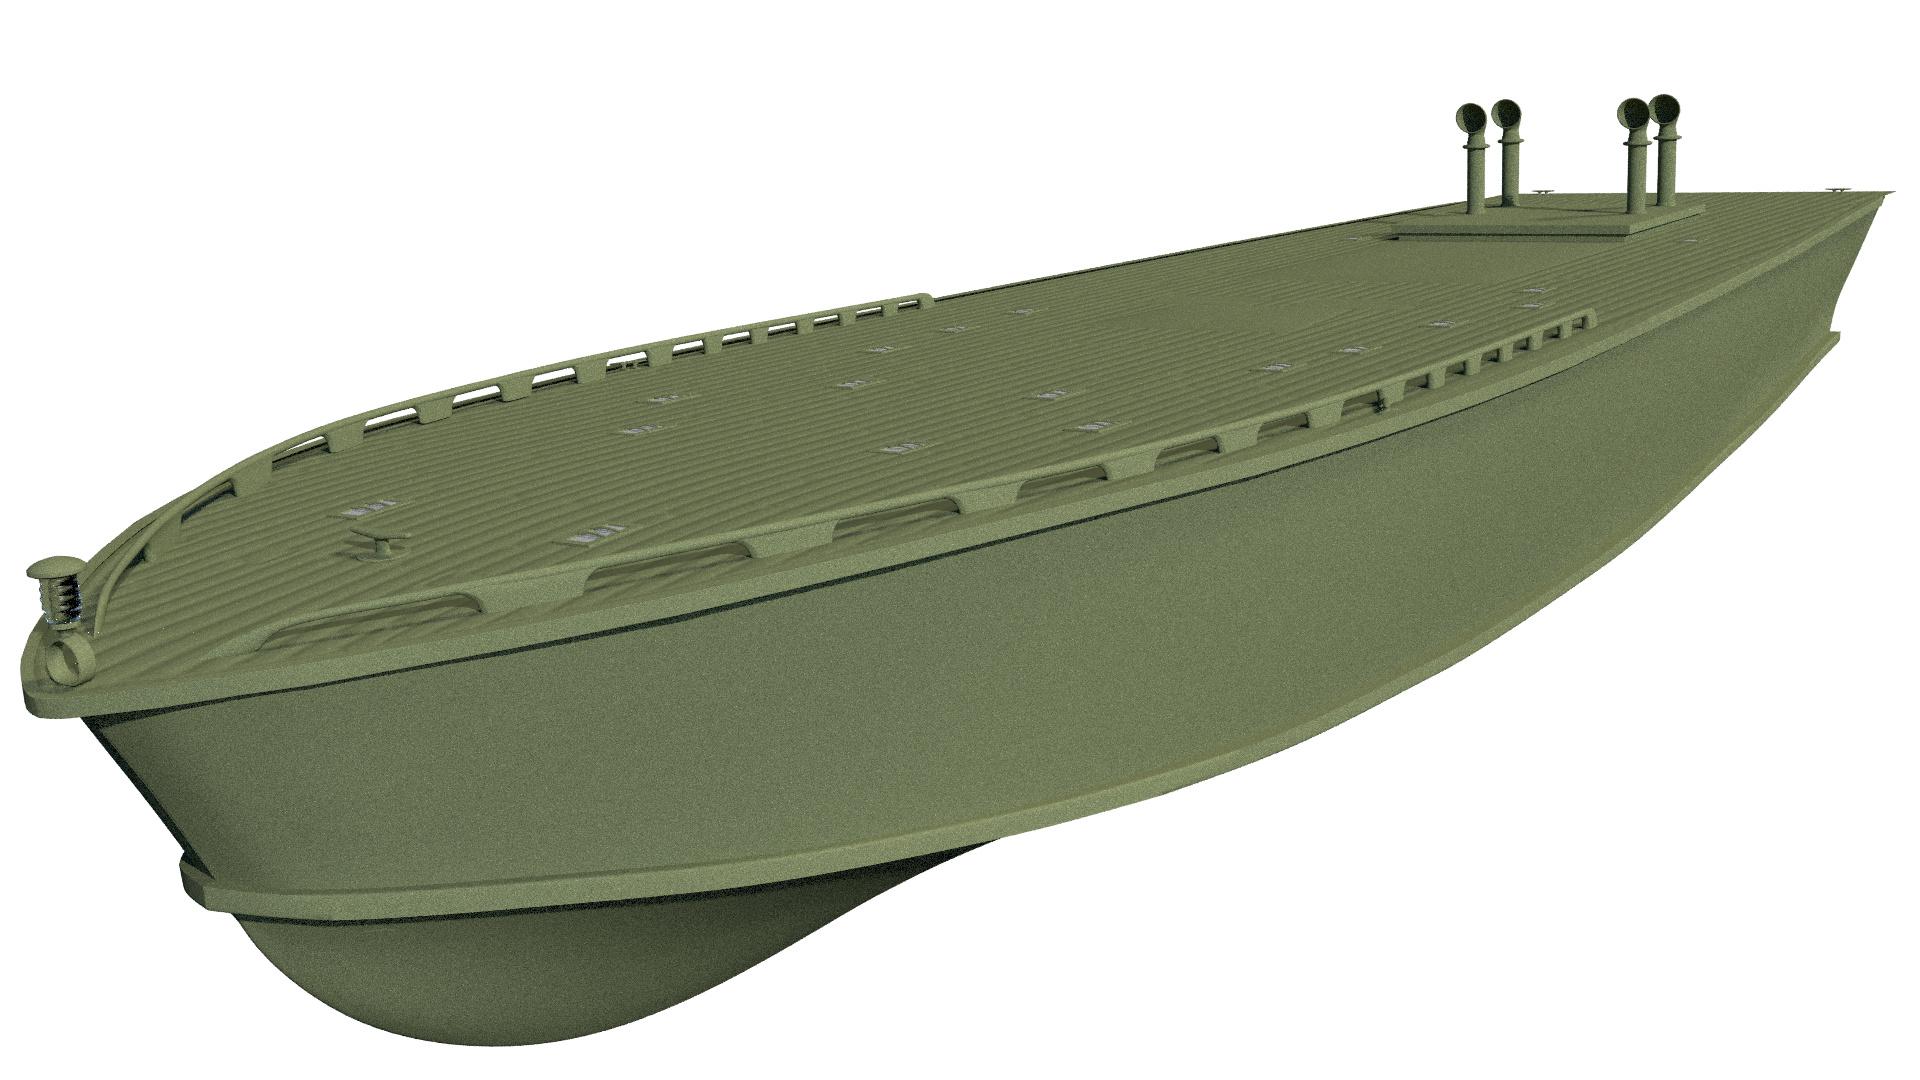 PT-109 Torpedo Patrol Boat - Works in Progress - Blender